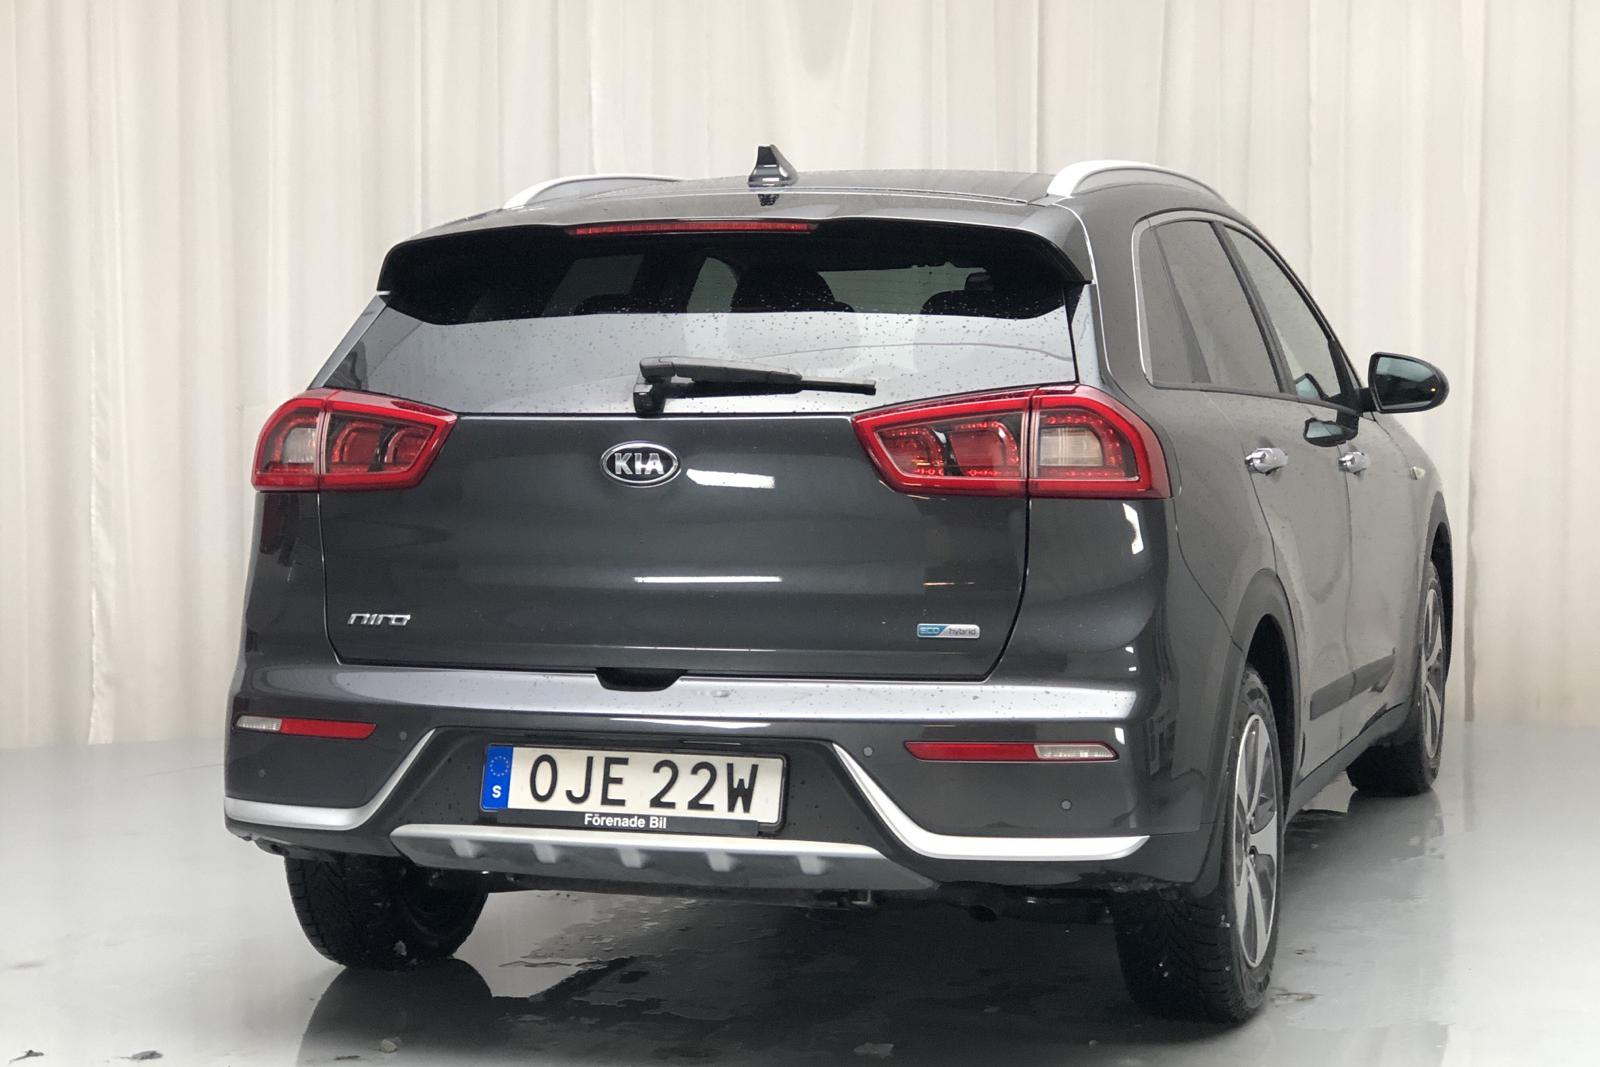 KIA Niro Hybrid 1.6 (141hk) - 21 200 km - Automatic - gray - 2019